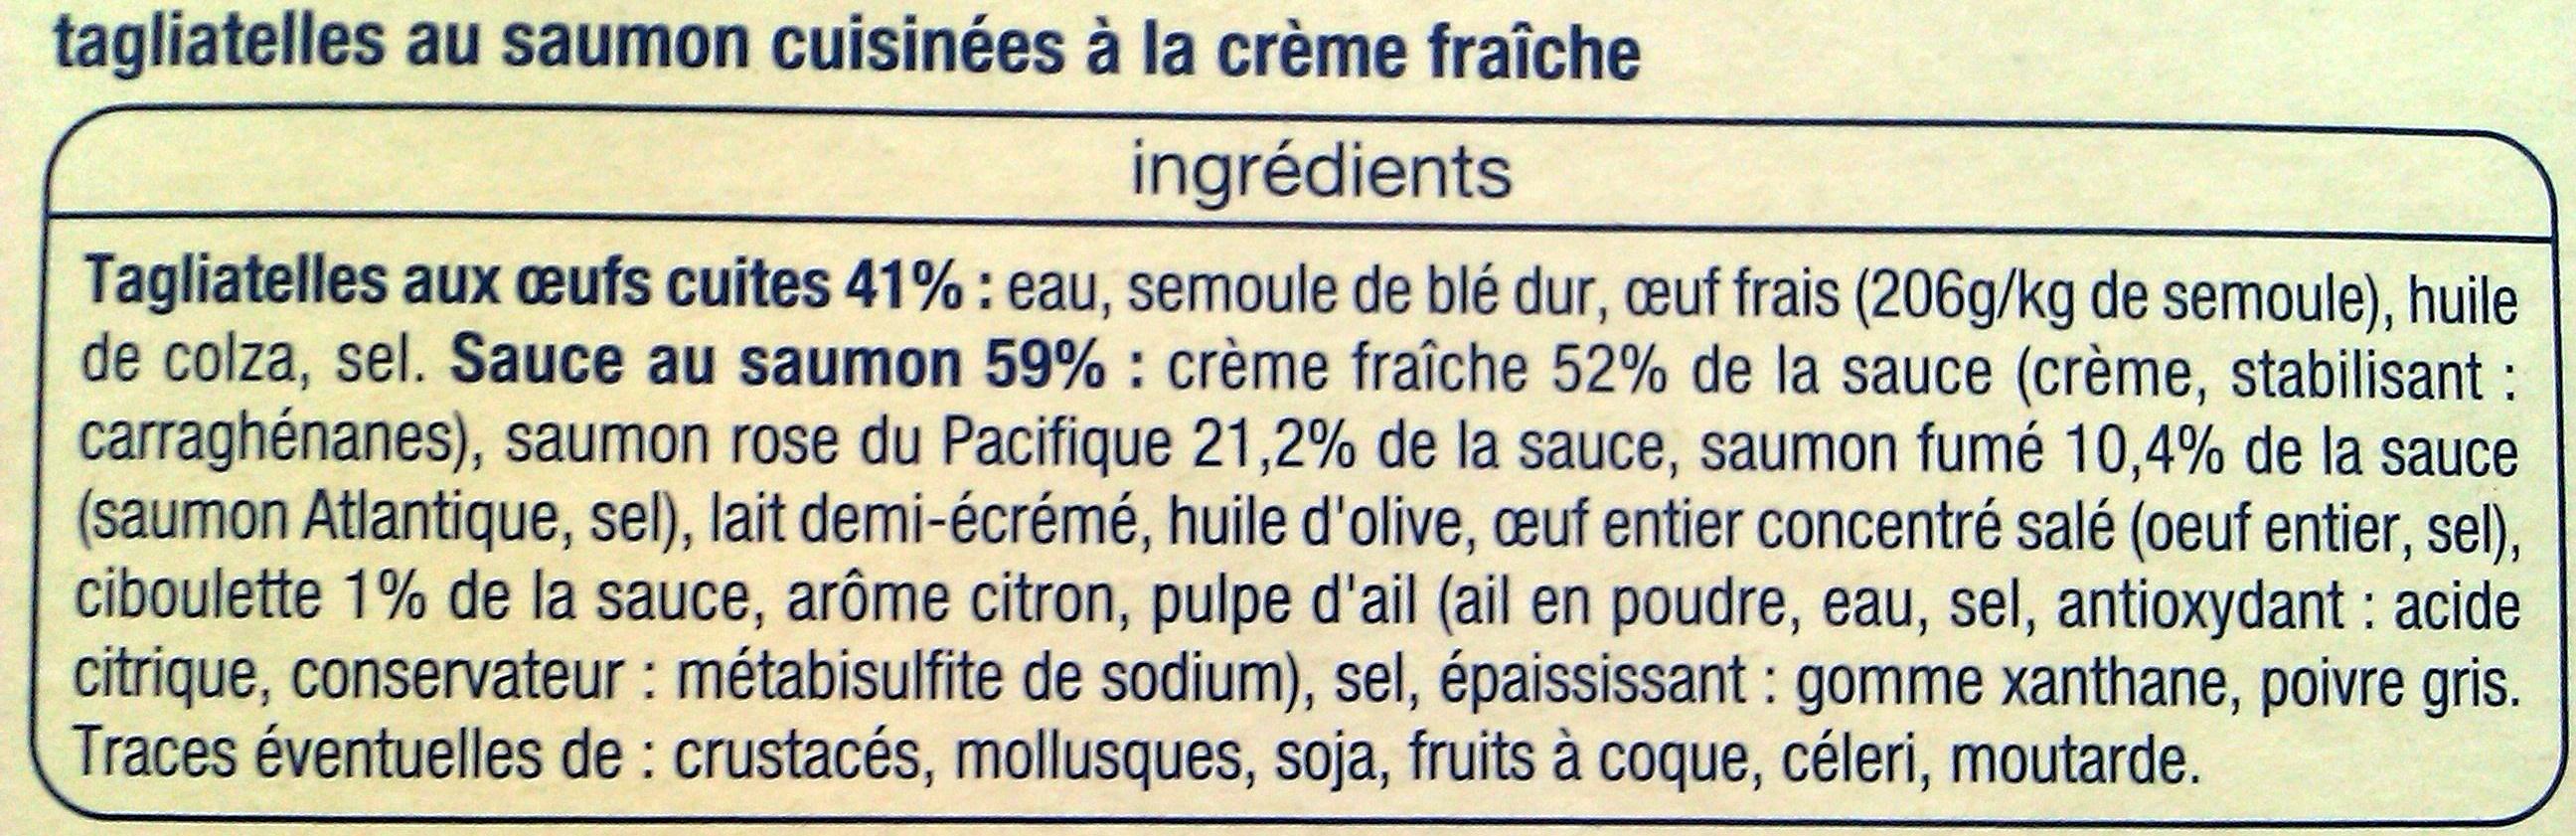 Tagliatelles Saumon - Ingredients